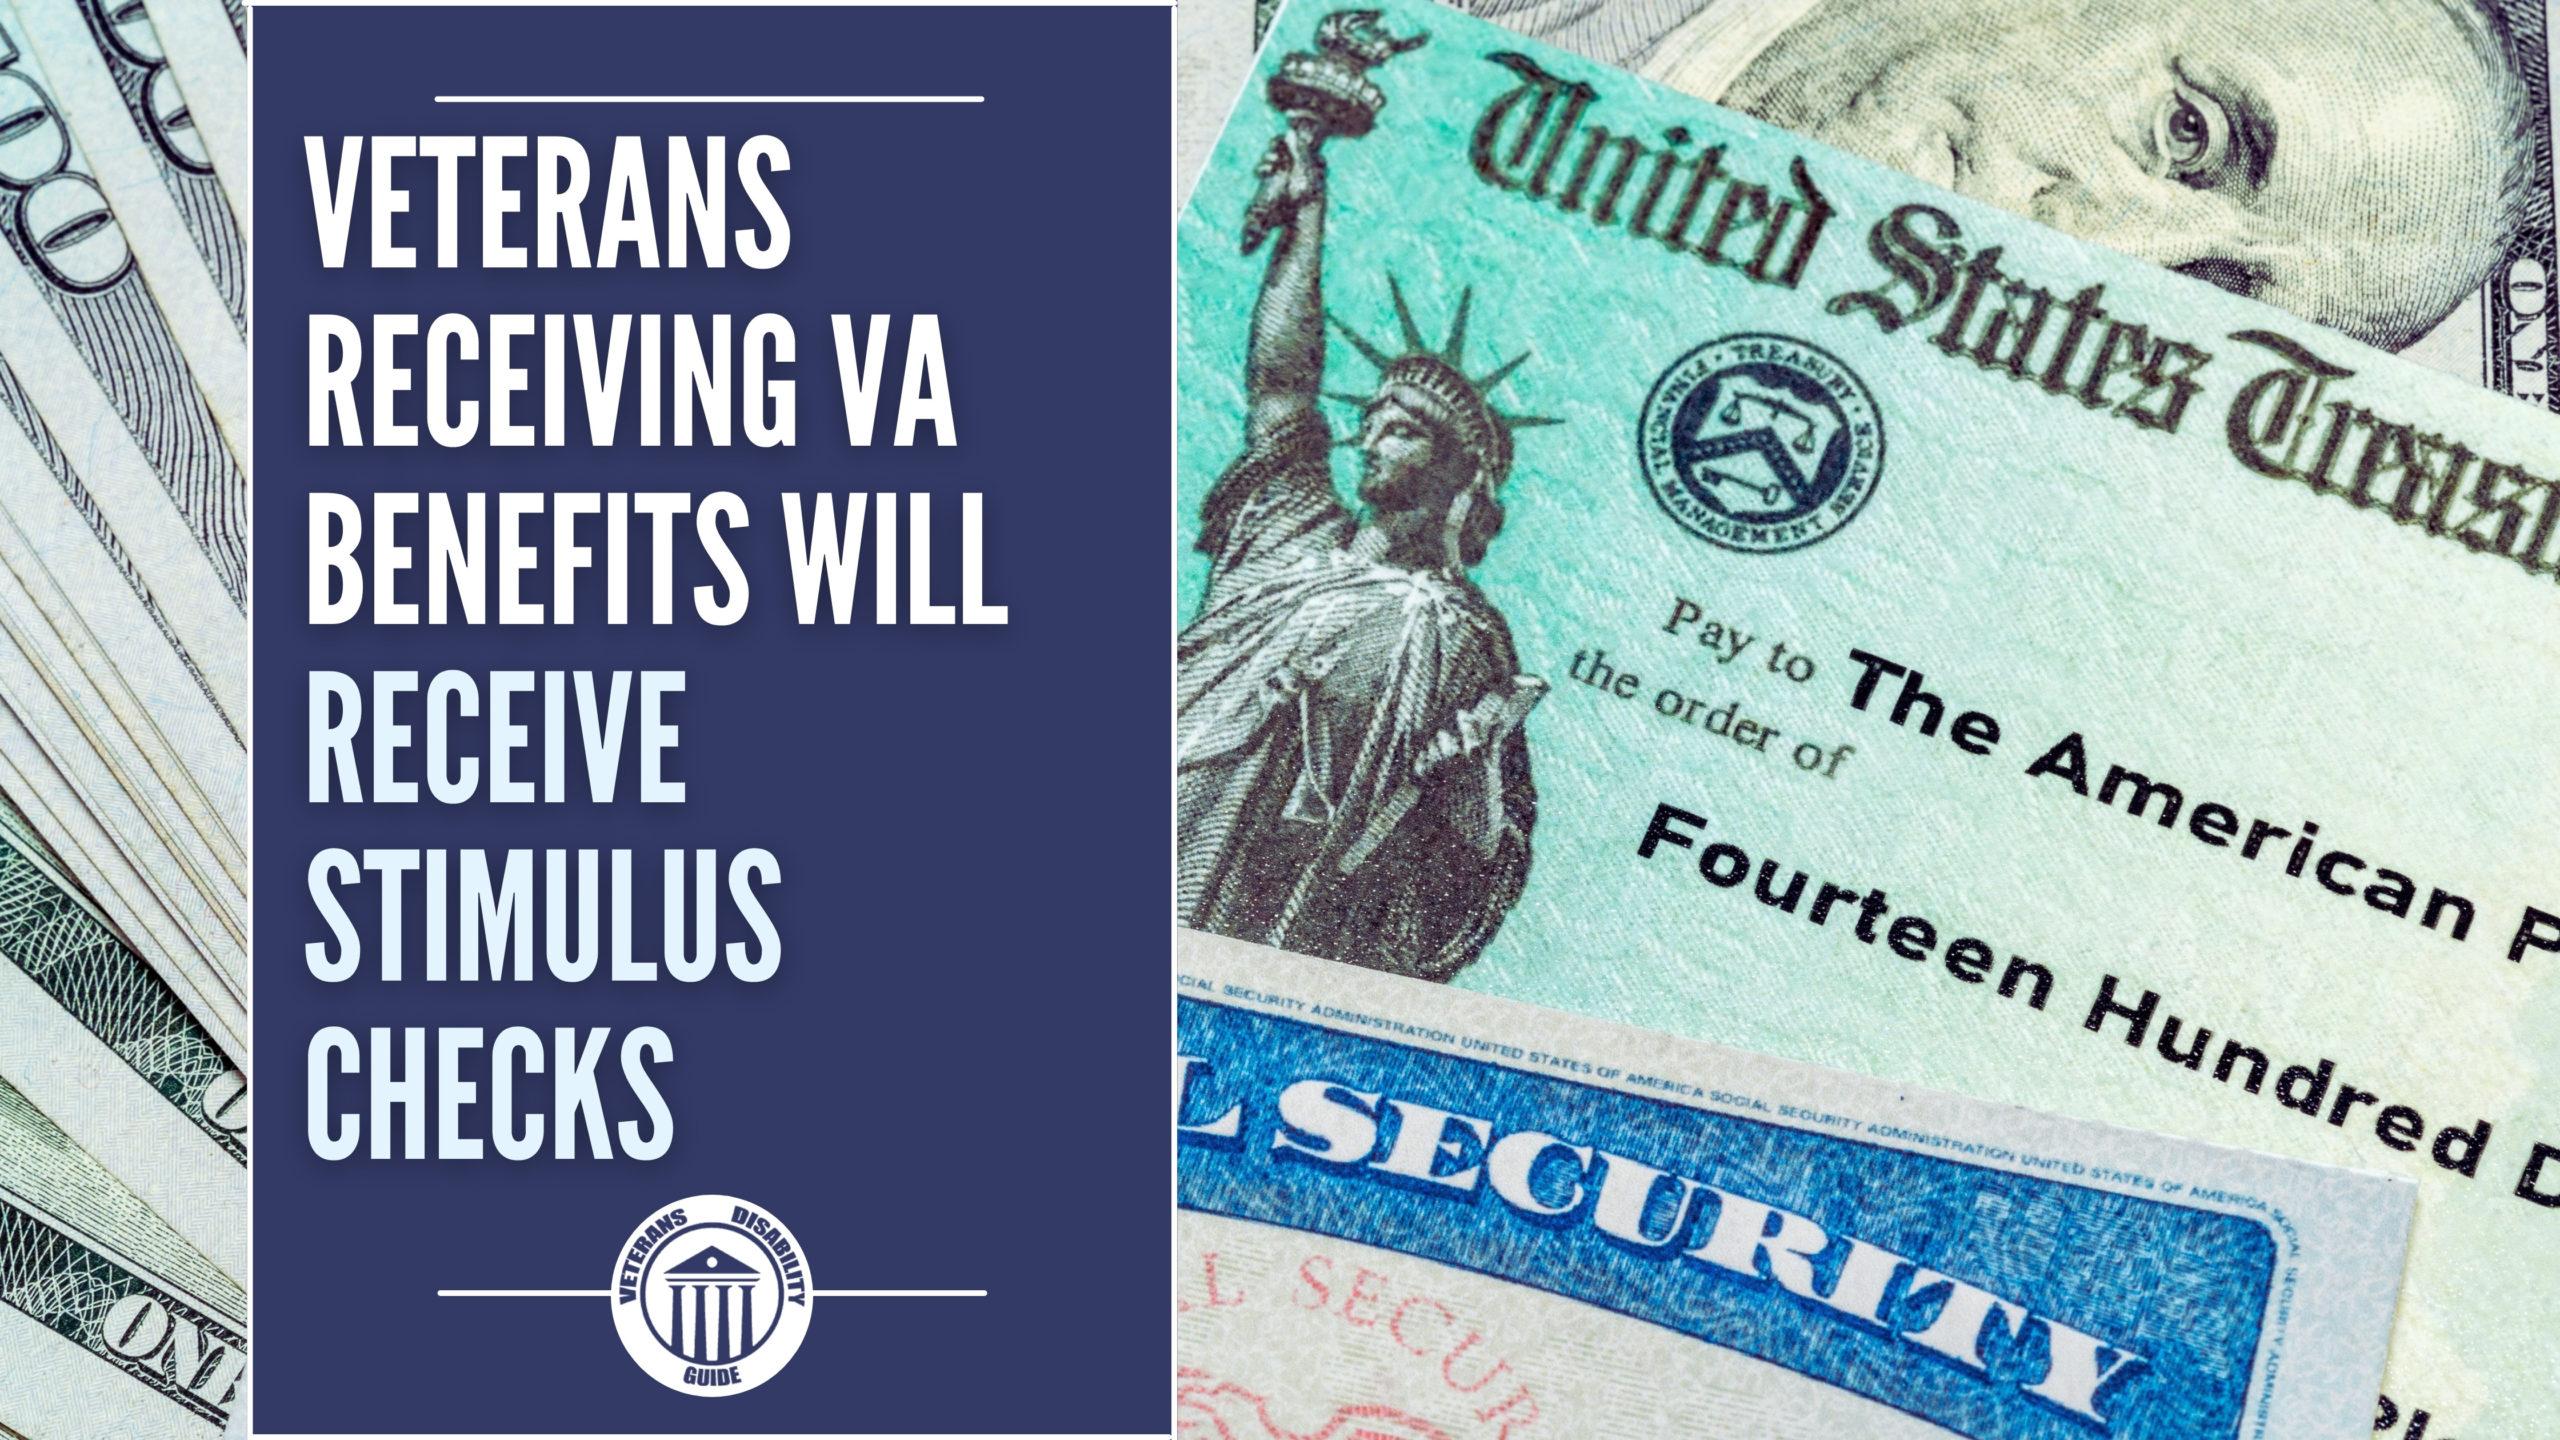 Veterans Receiving VA Benefits Will Receive Stimulus Checks blog header image